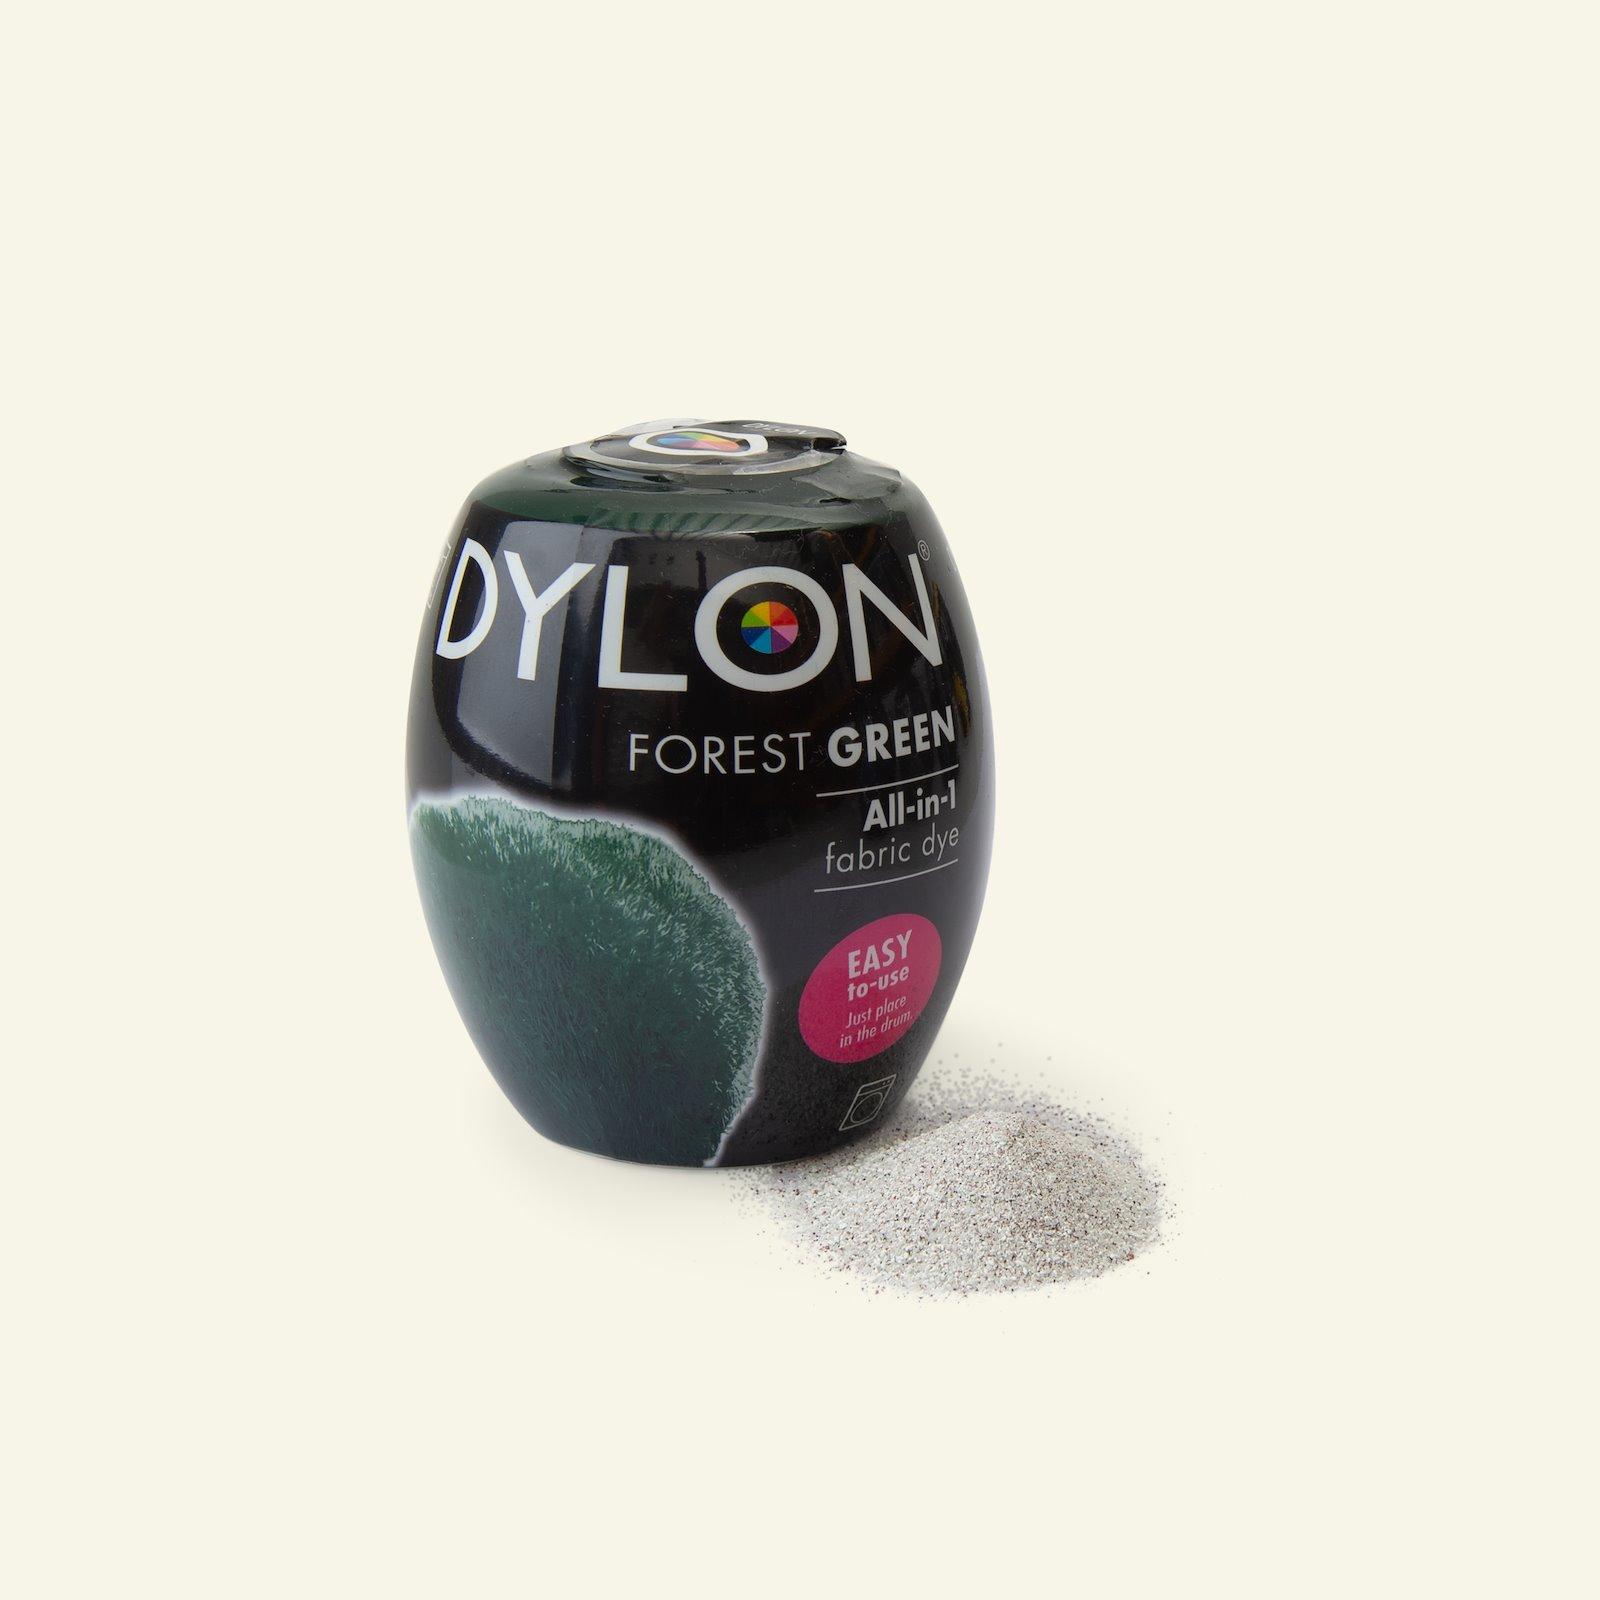 Dylon fabric dye for machine dark green 29704_pack